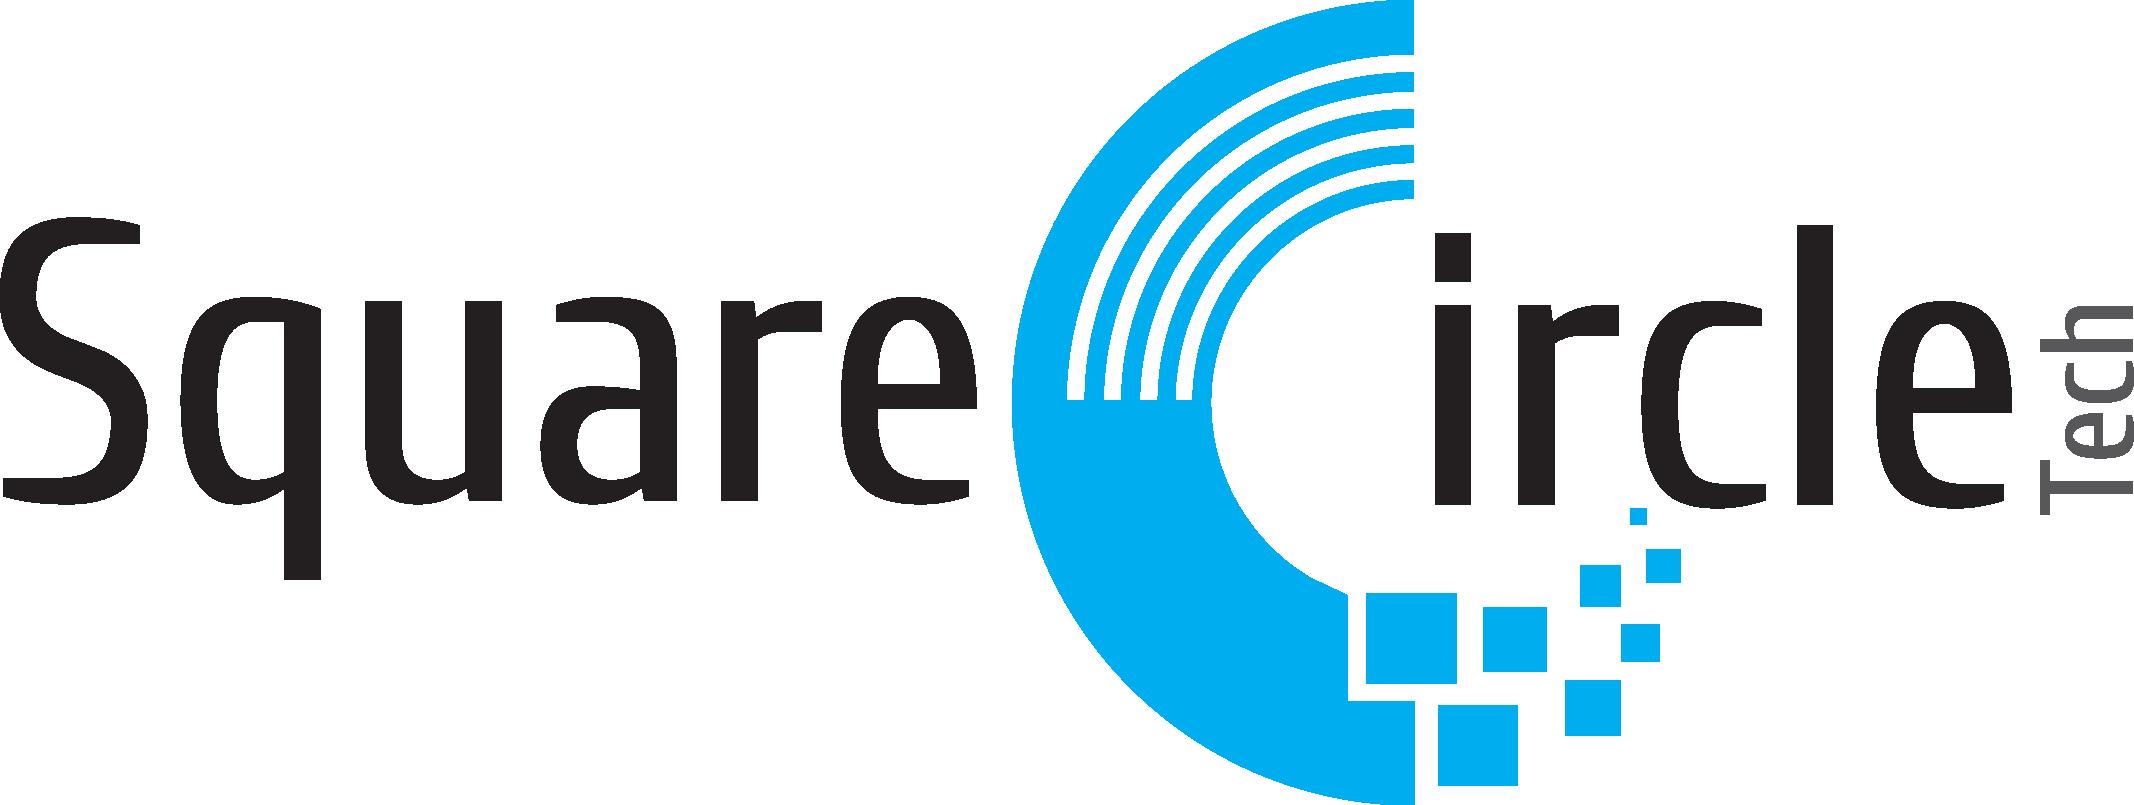 SquareCircle Tech Logo